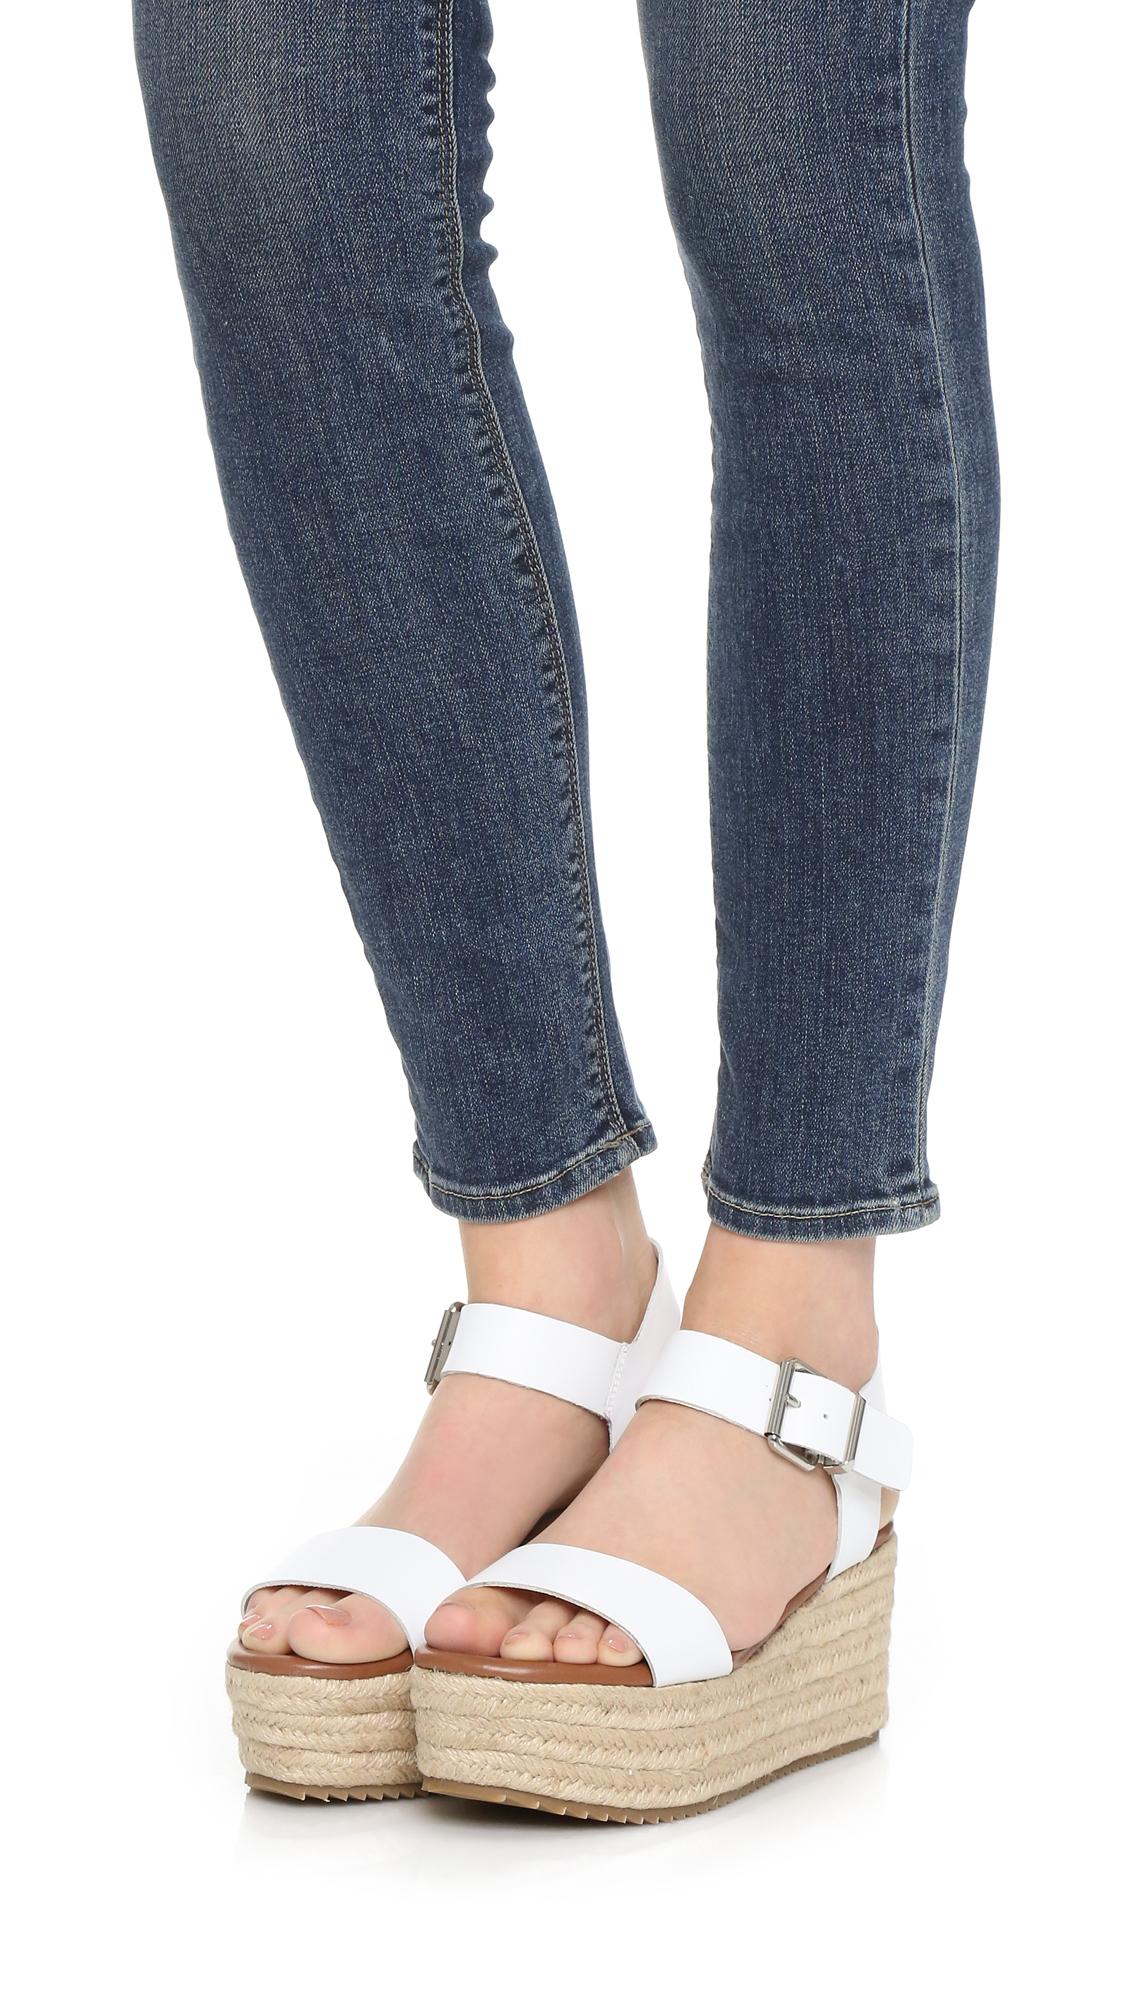 9cad16b1037 Lyst - Steven by Steve Madden Sabbie Flatform Sandals in White